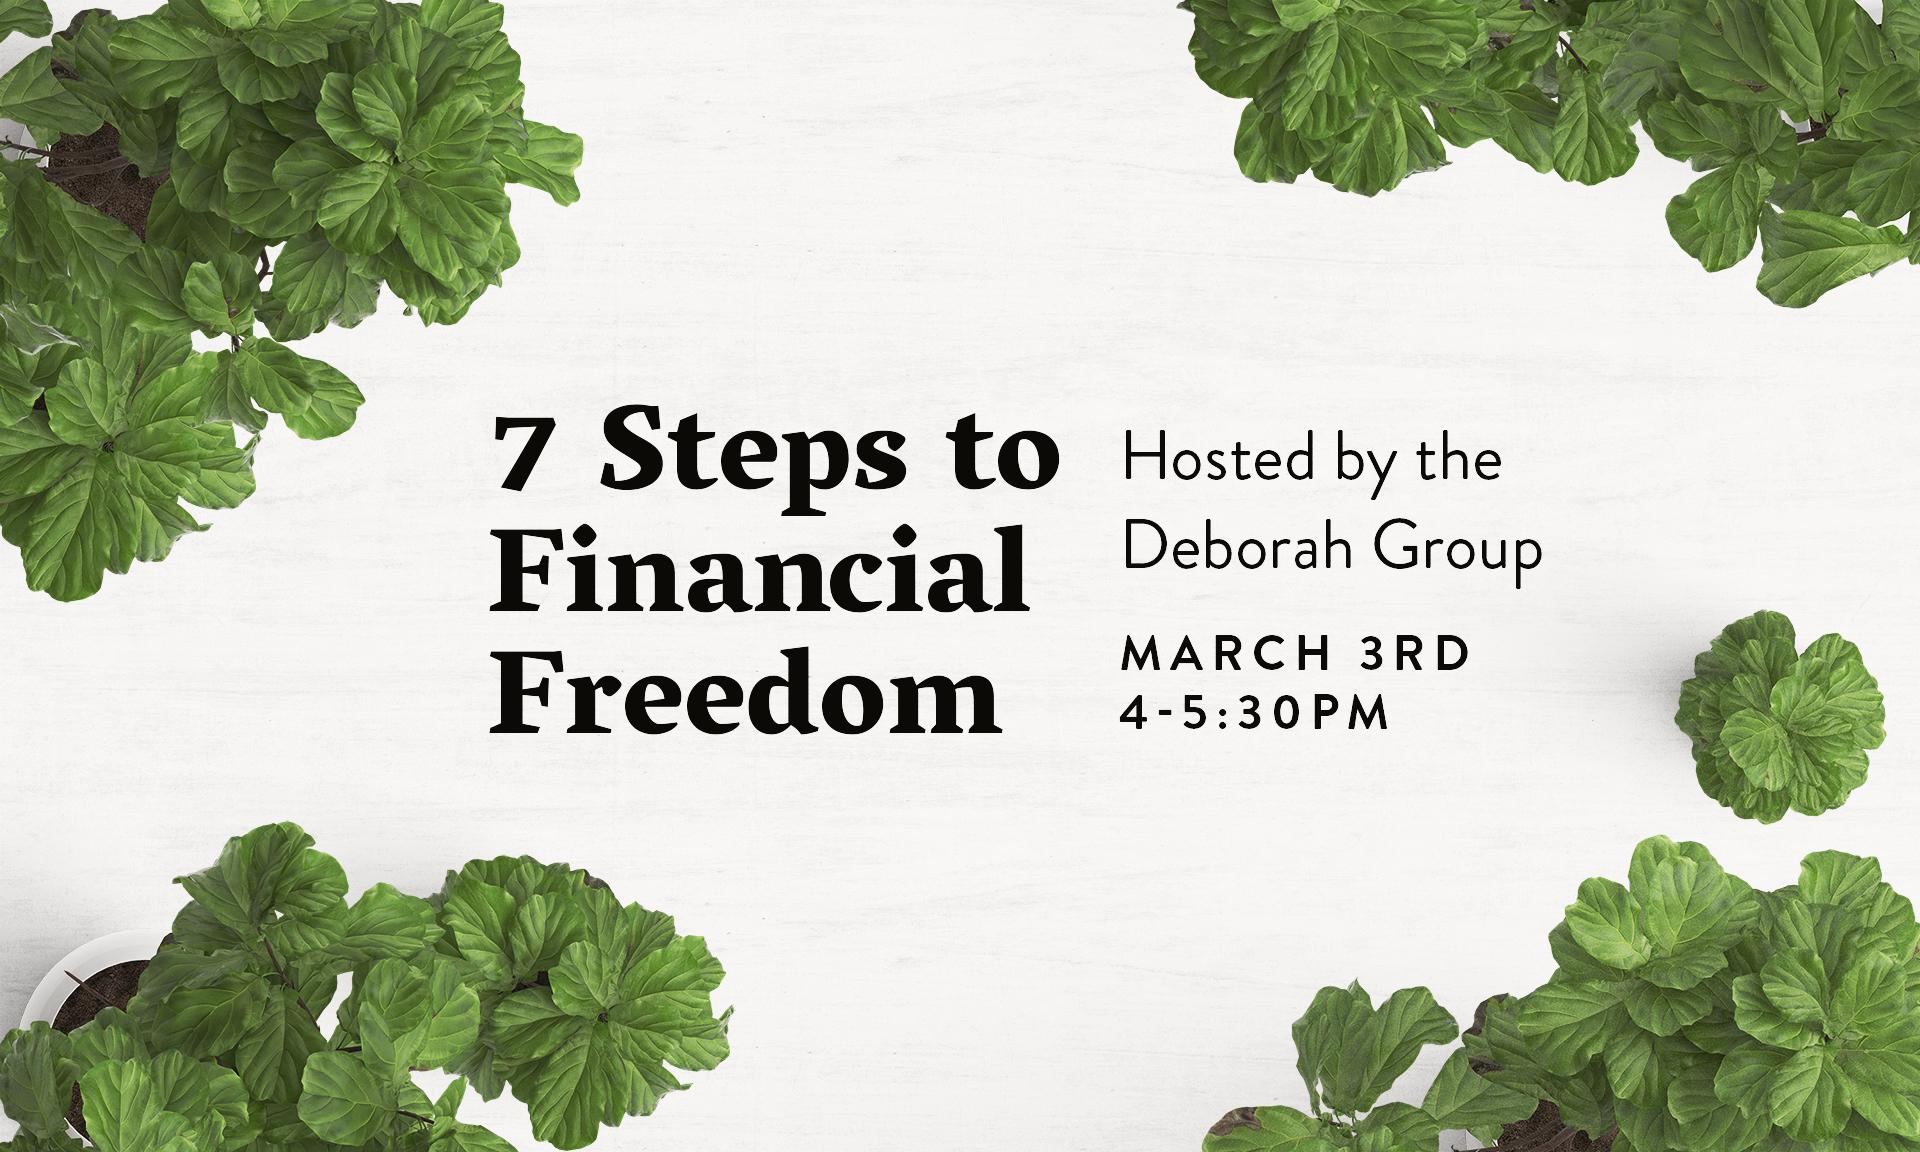 7_Steps_to_Financial_Freedom.jpg